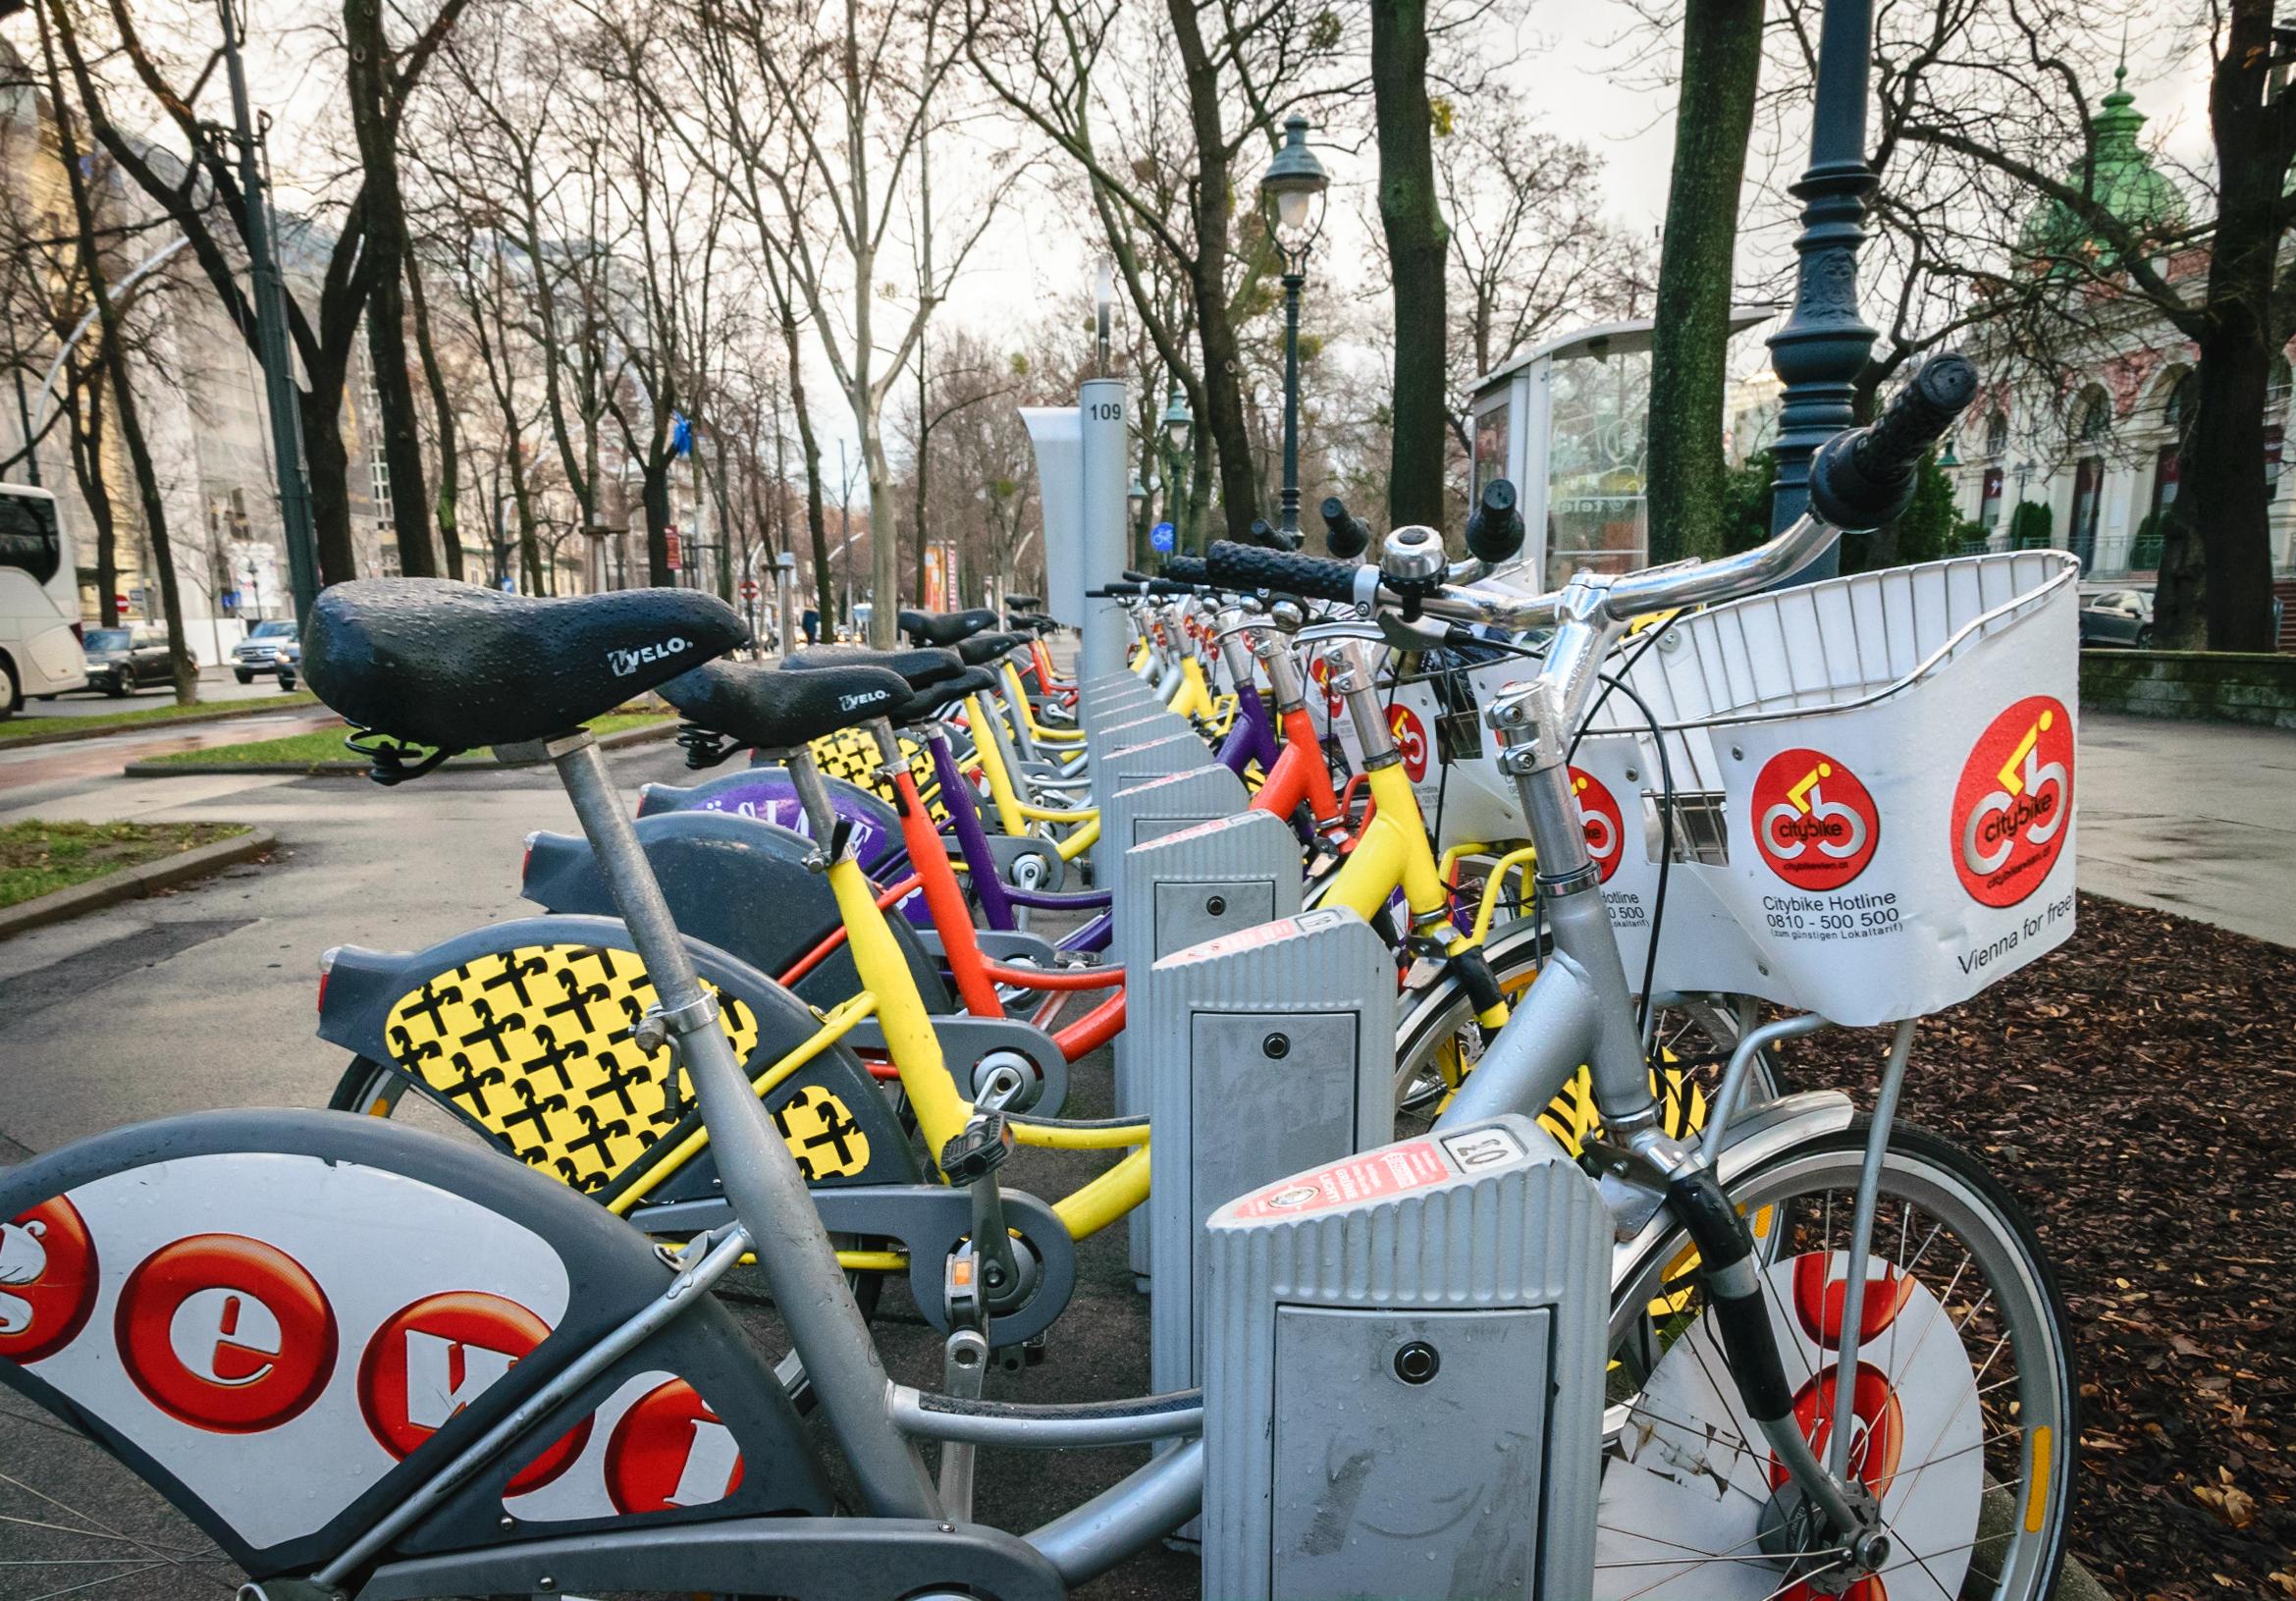 the city's colorful bikeshare program